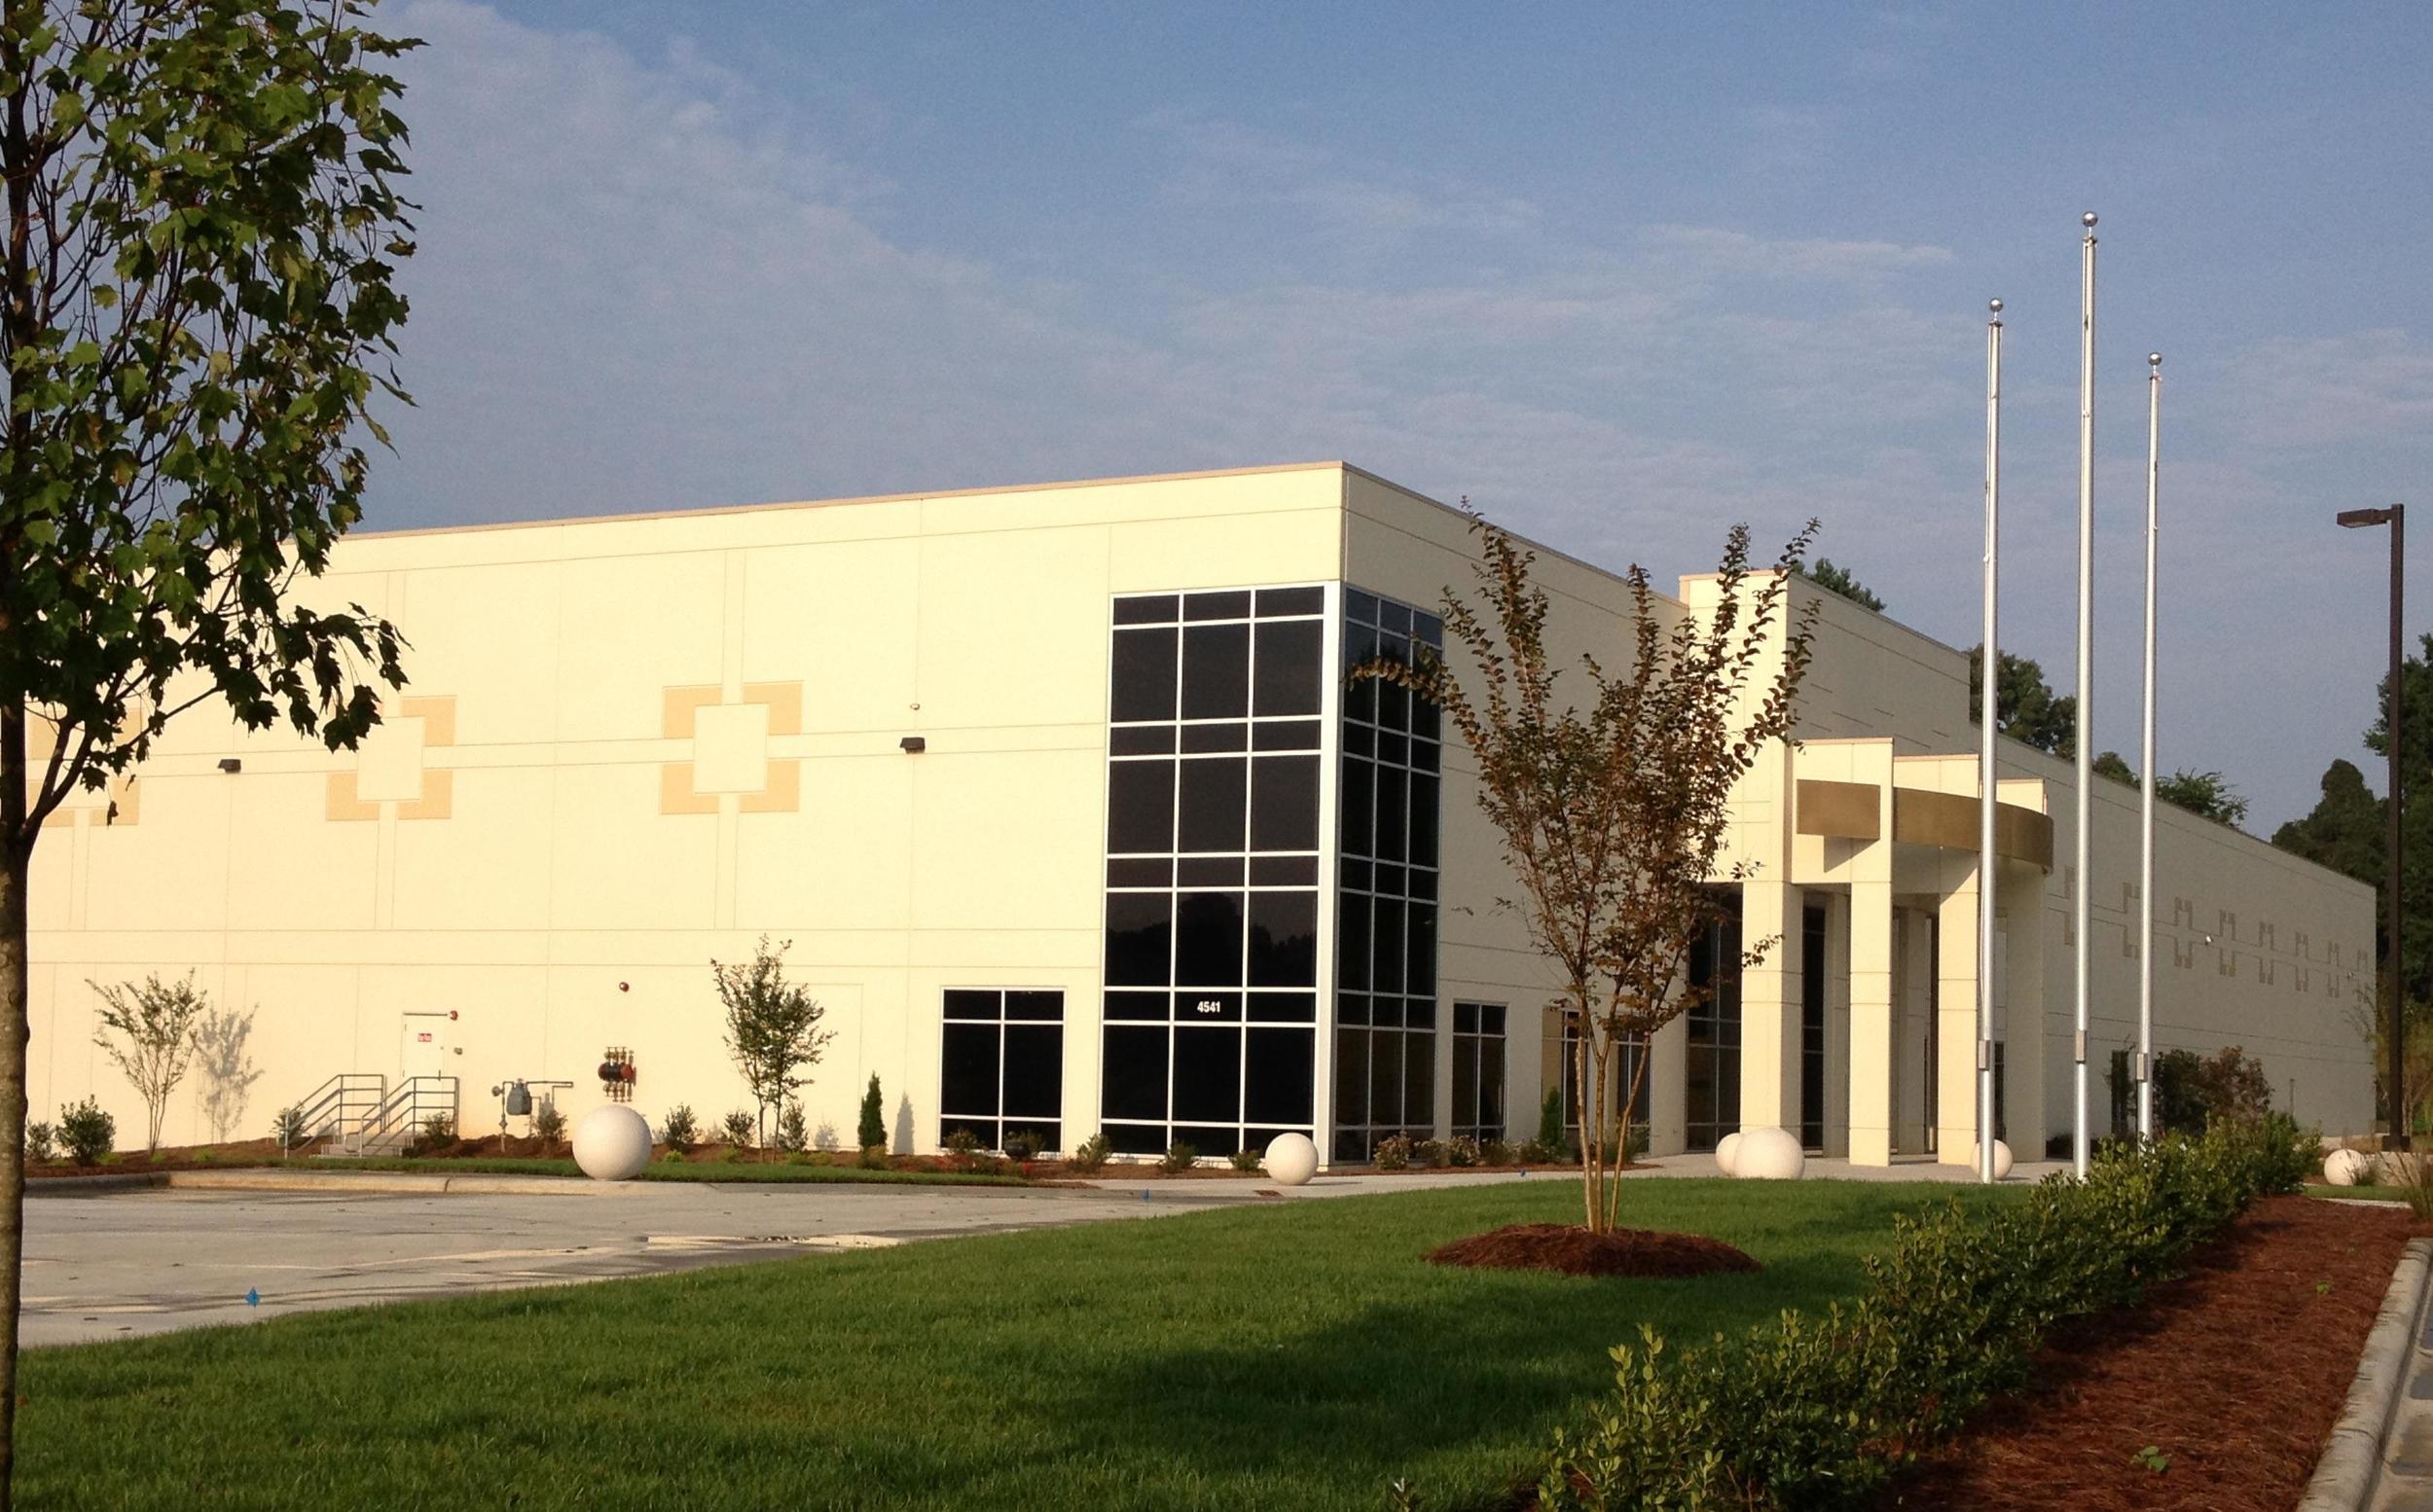 Building Design Services In Charlotte Nc Area